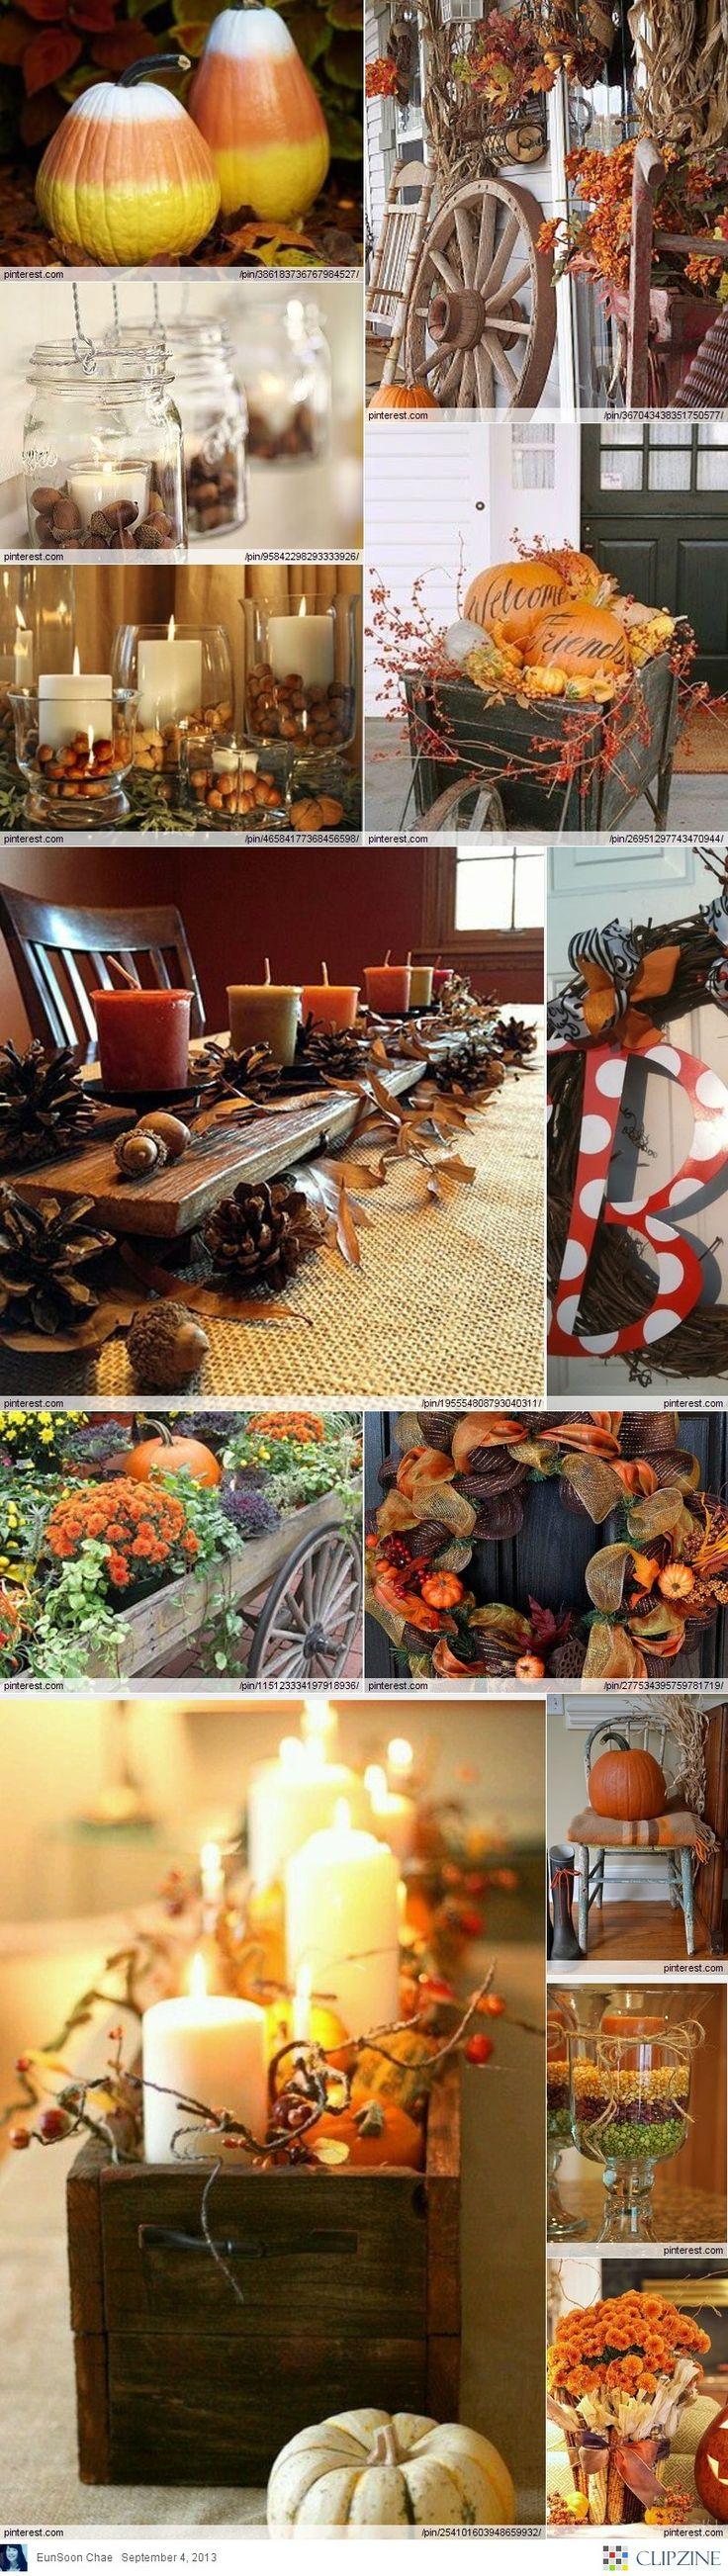 best halloween holiday cheer images on pinterest halloween